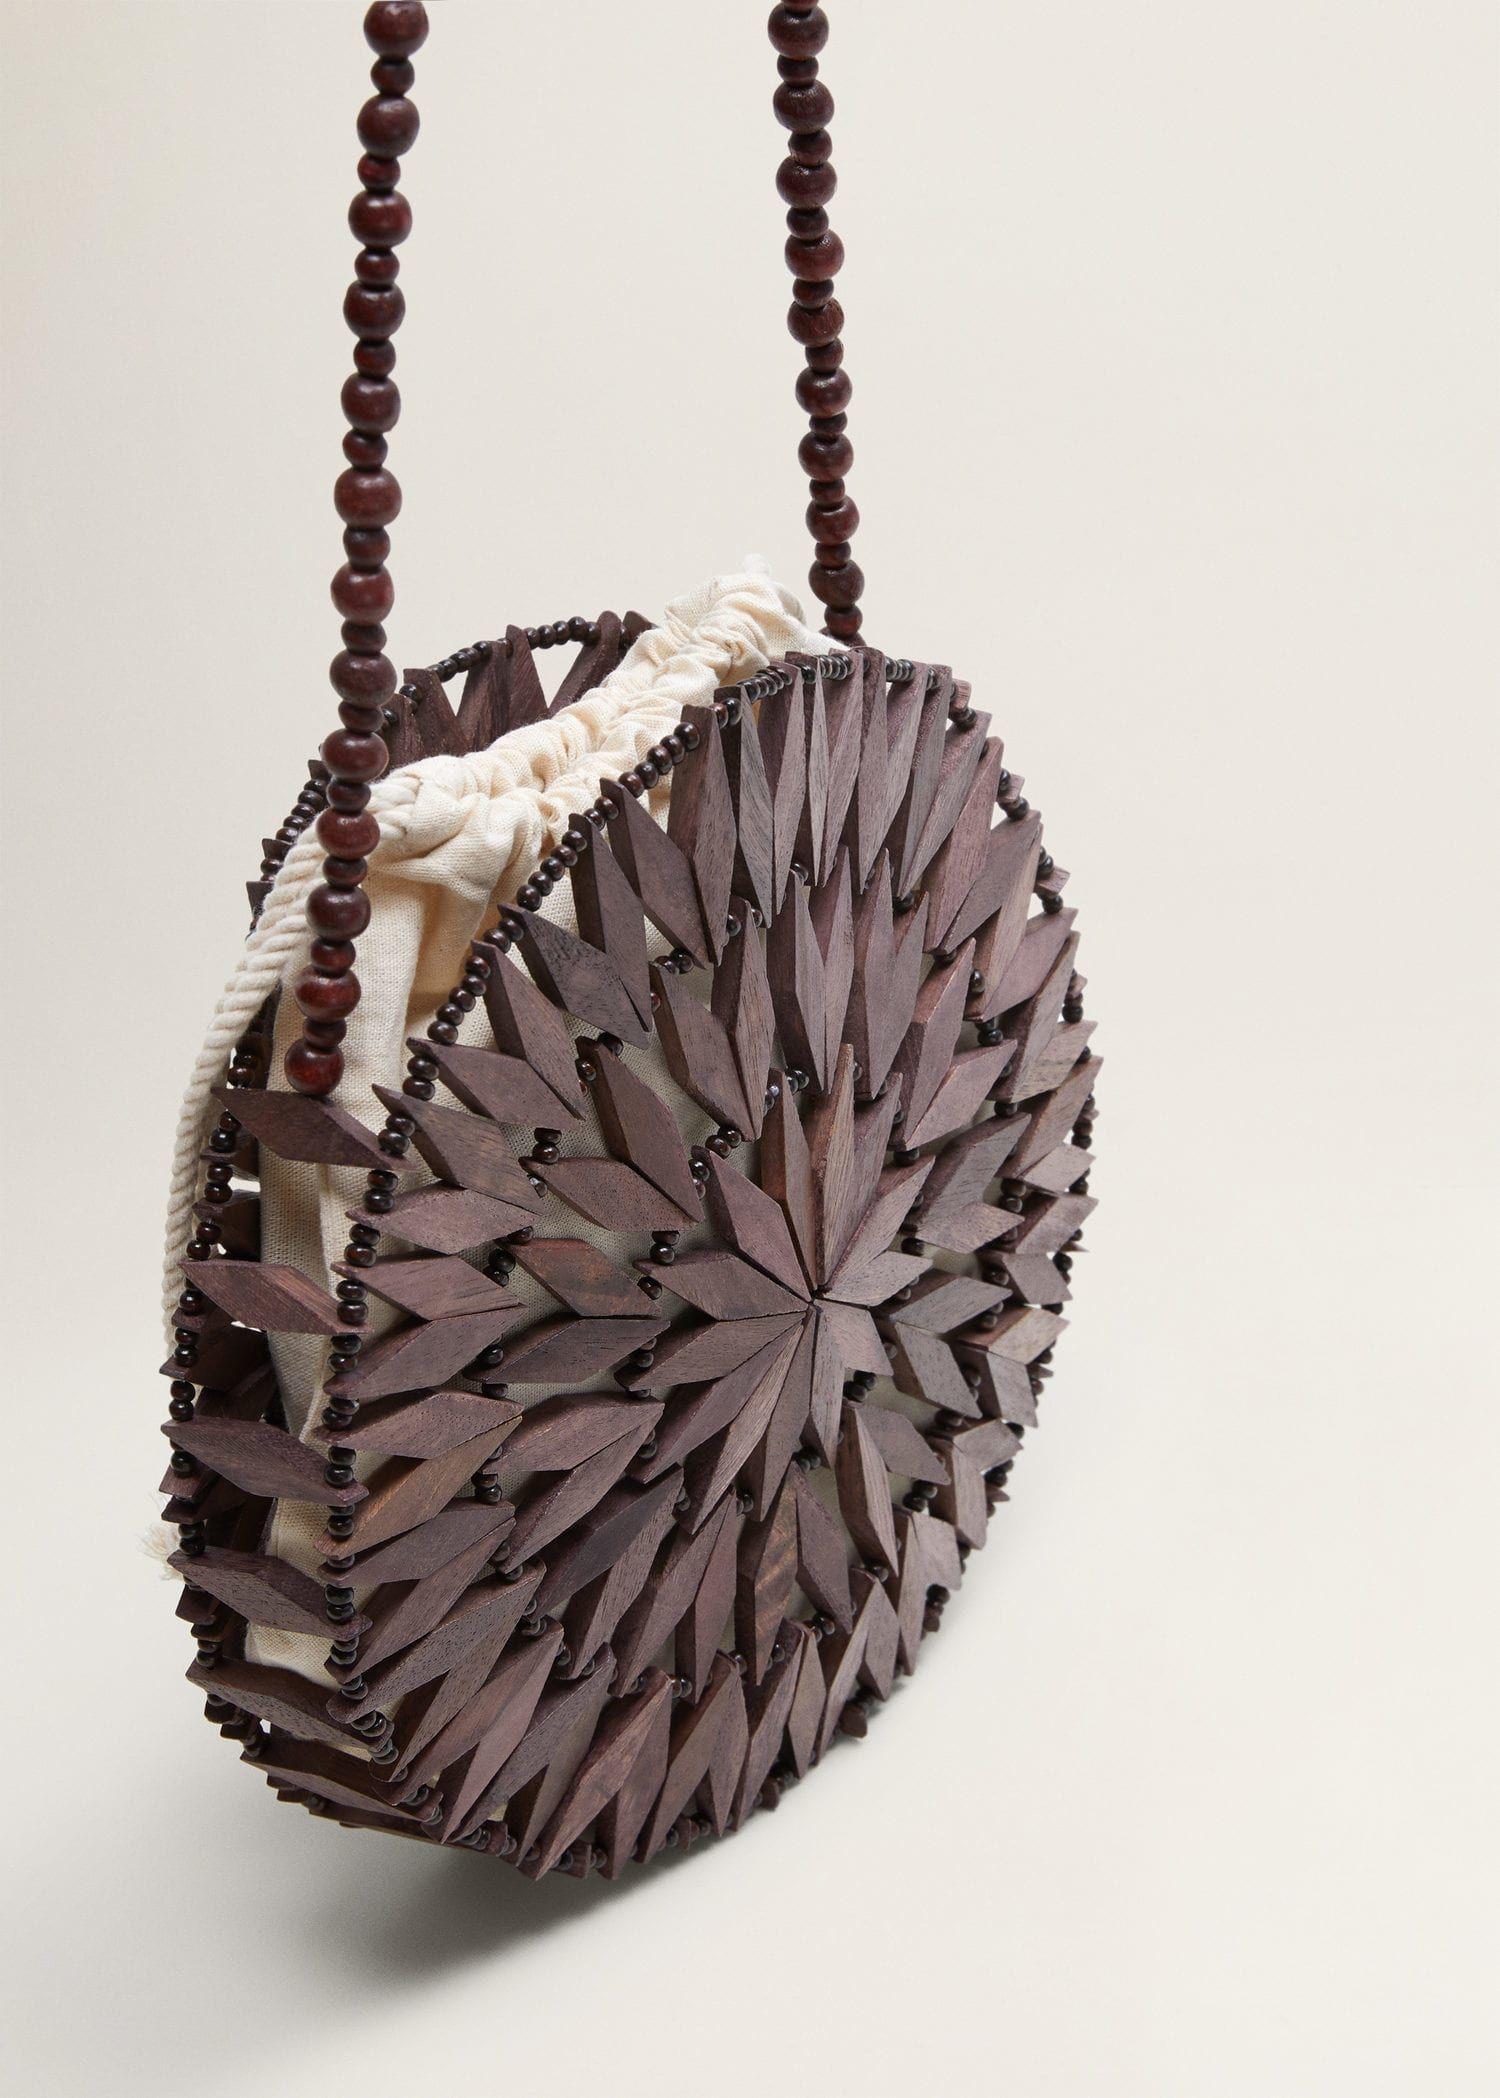 Beaded Wood Bag Women Bags Bags Bags Bags Fashion